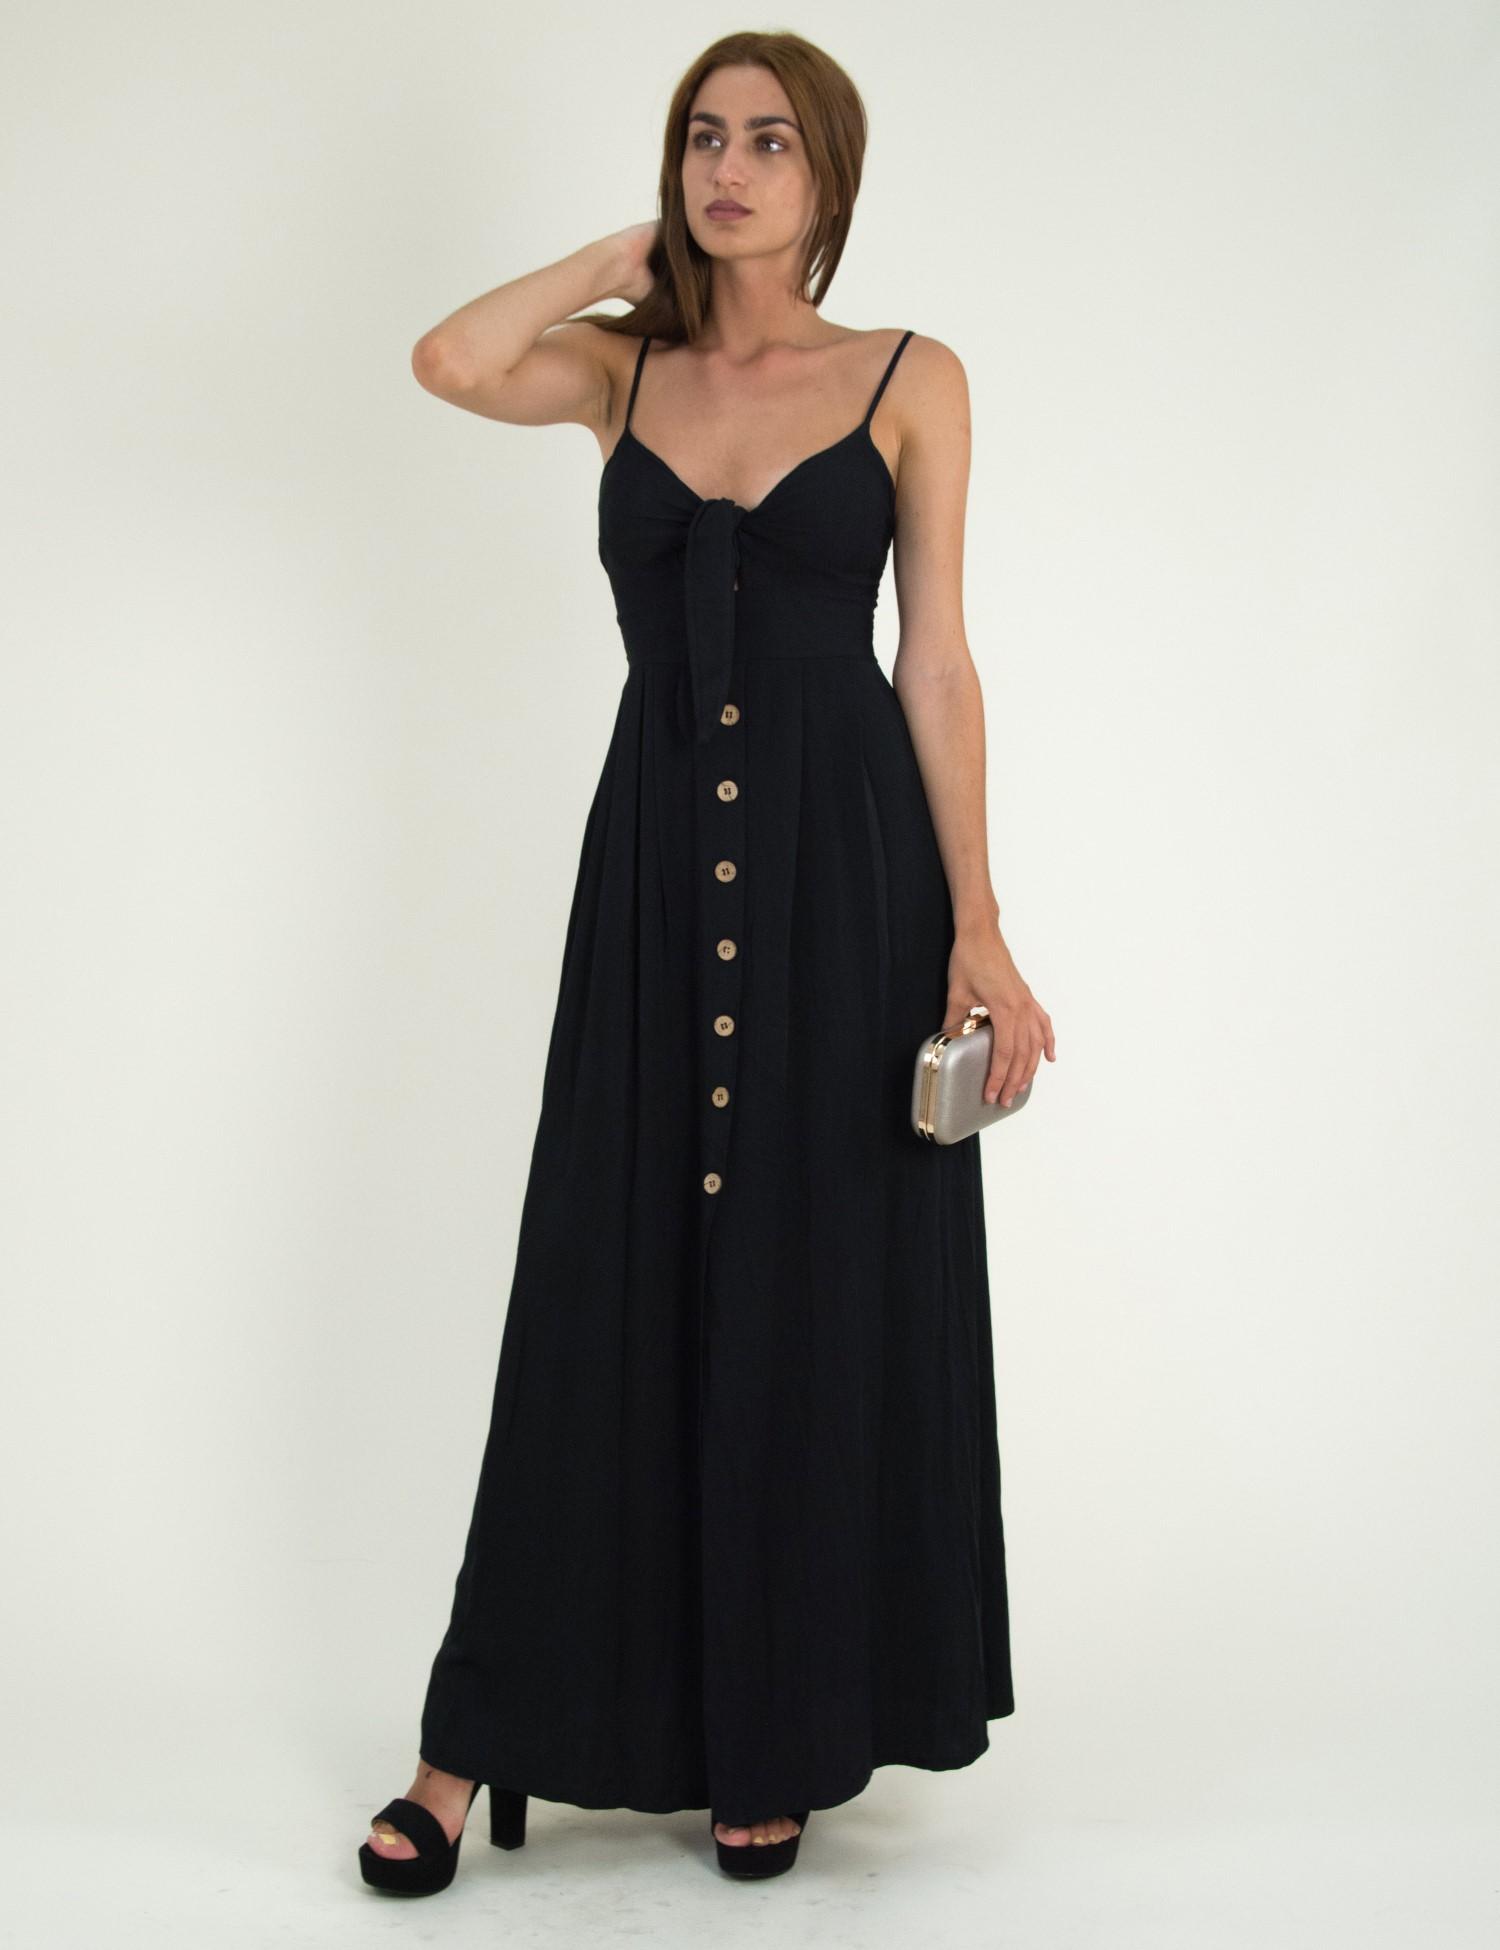 0fc5116984e4 Γυναικεία   Ρούχα   Φορέματα   Καθημερινά   Γυναικείο φόρεμα με ...